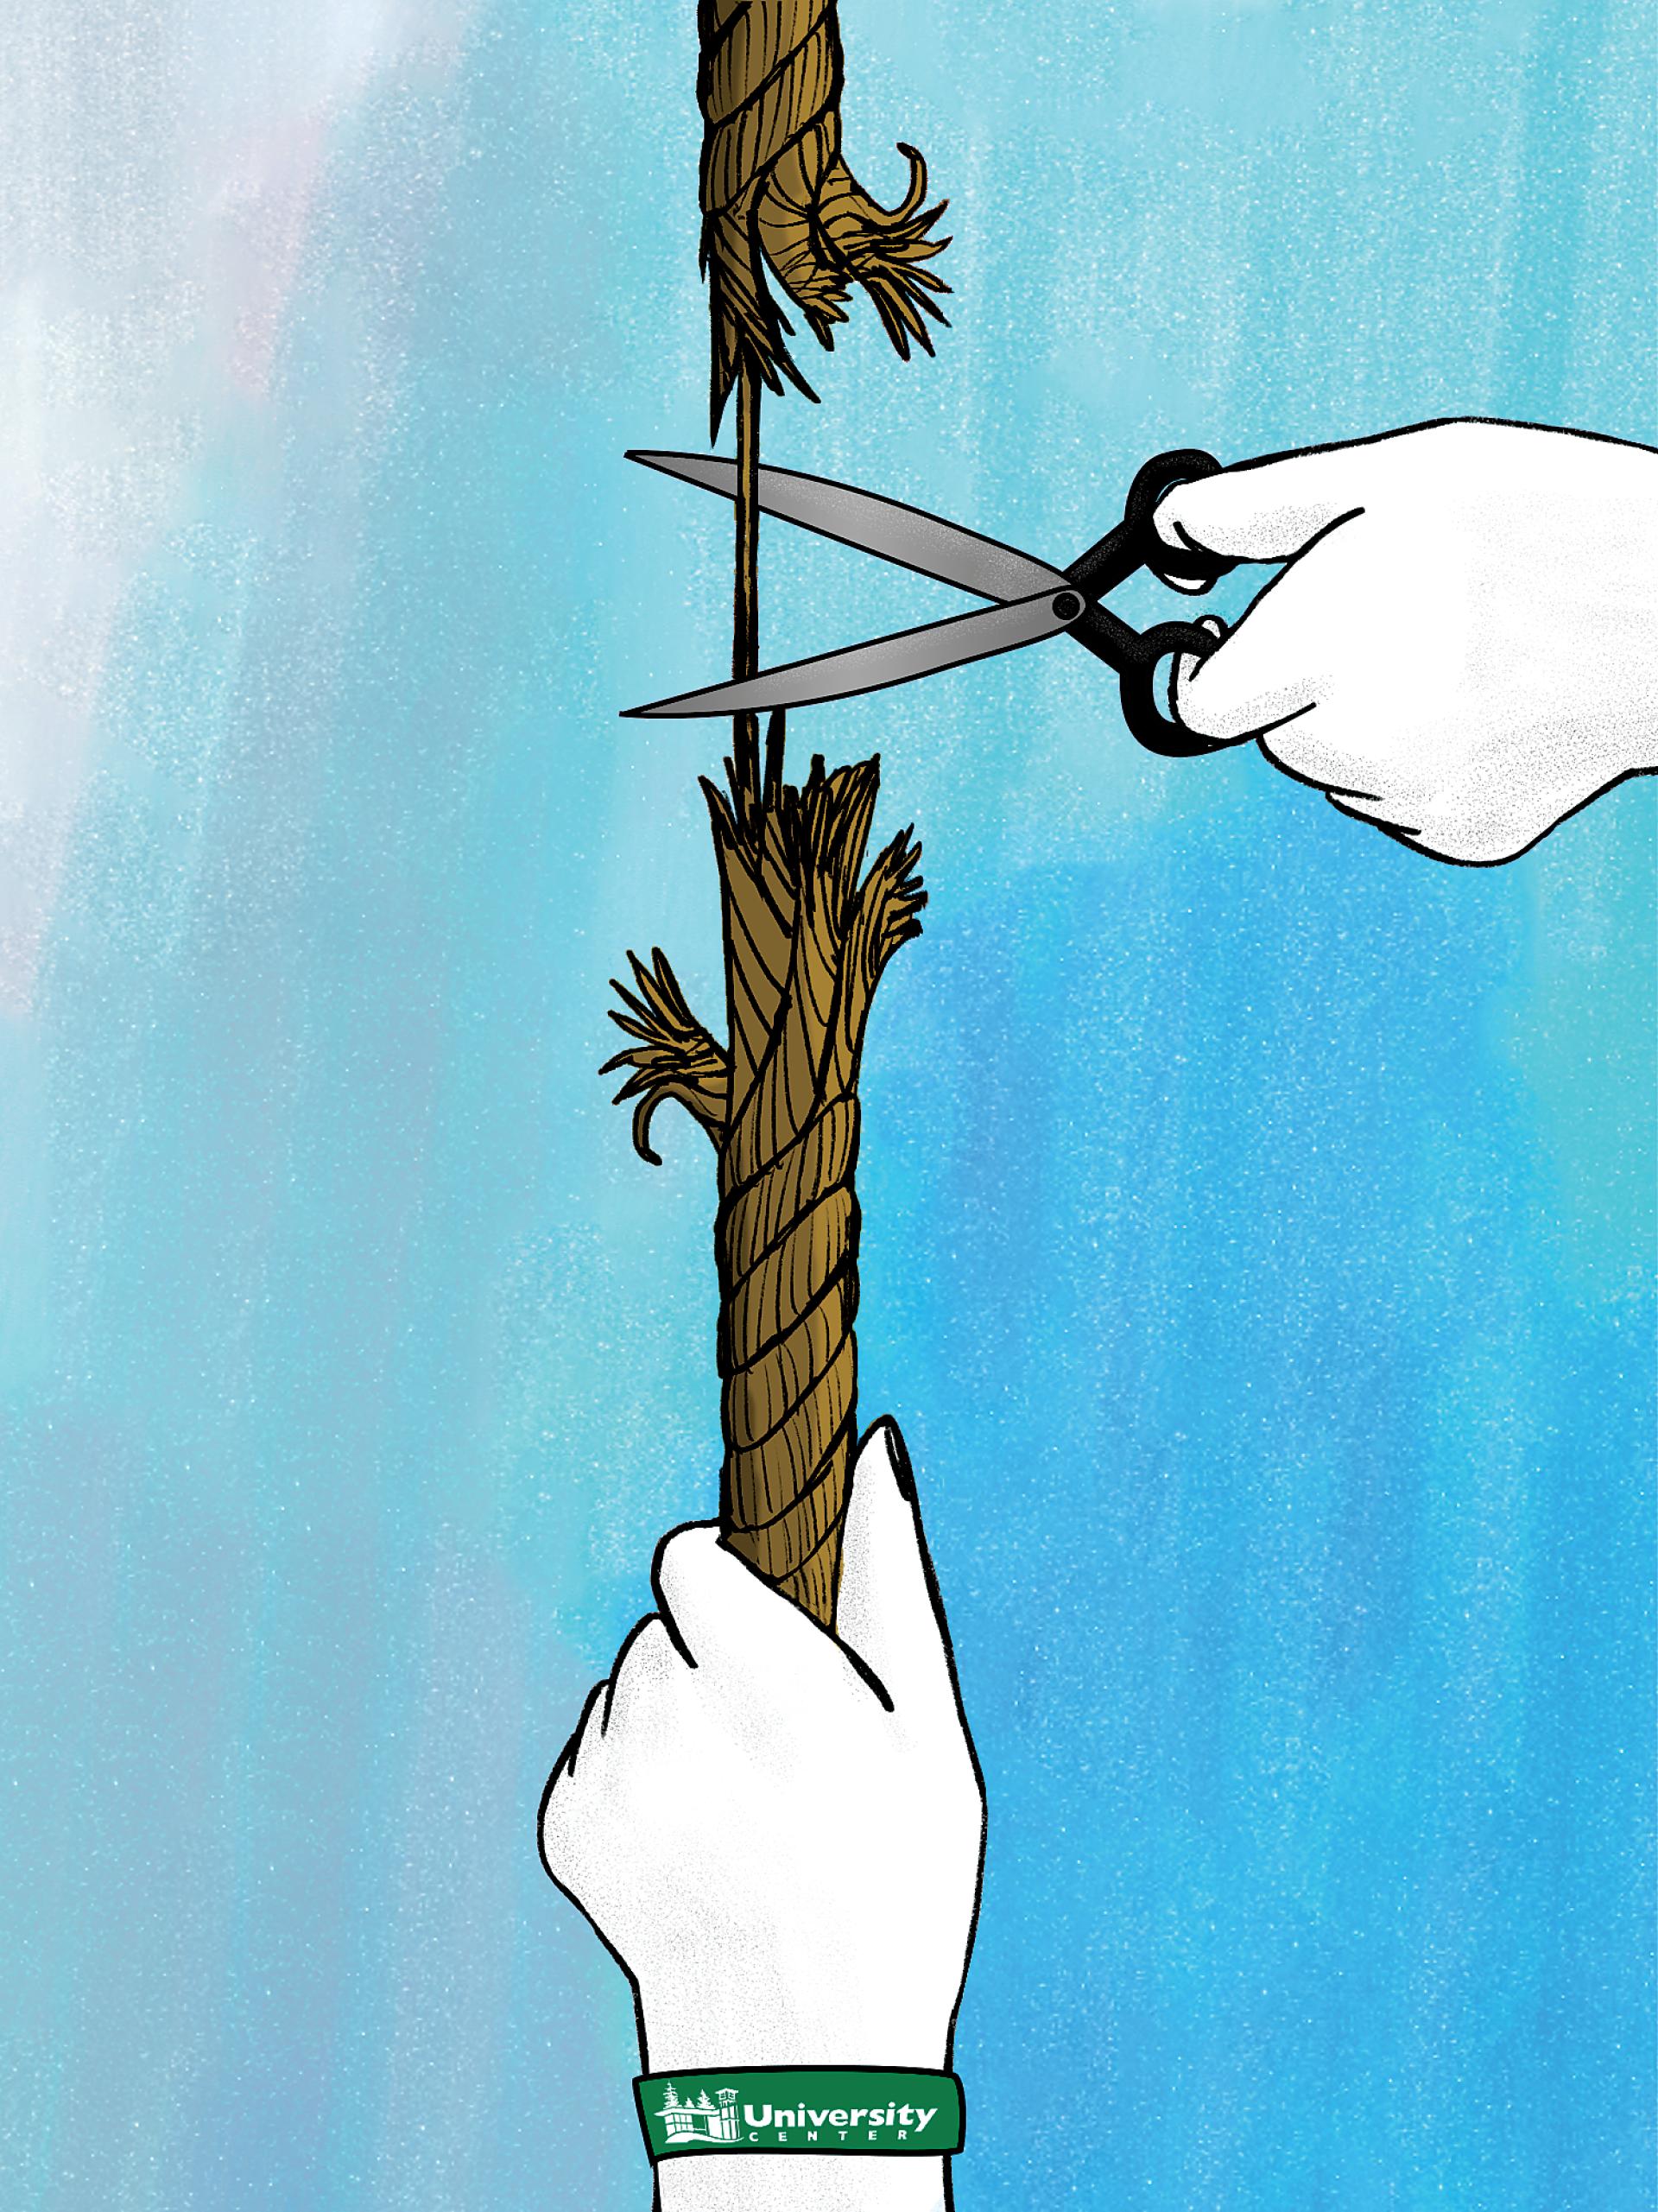 Illustration by Sam Papavasiliou